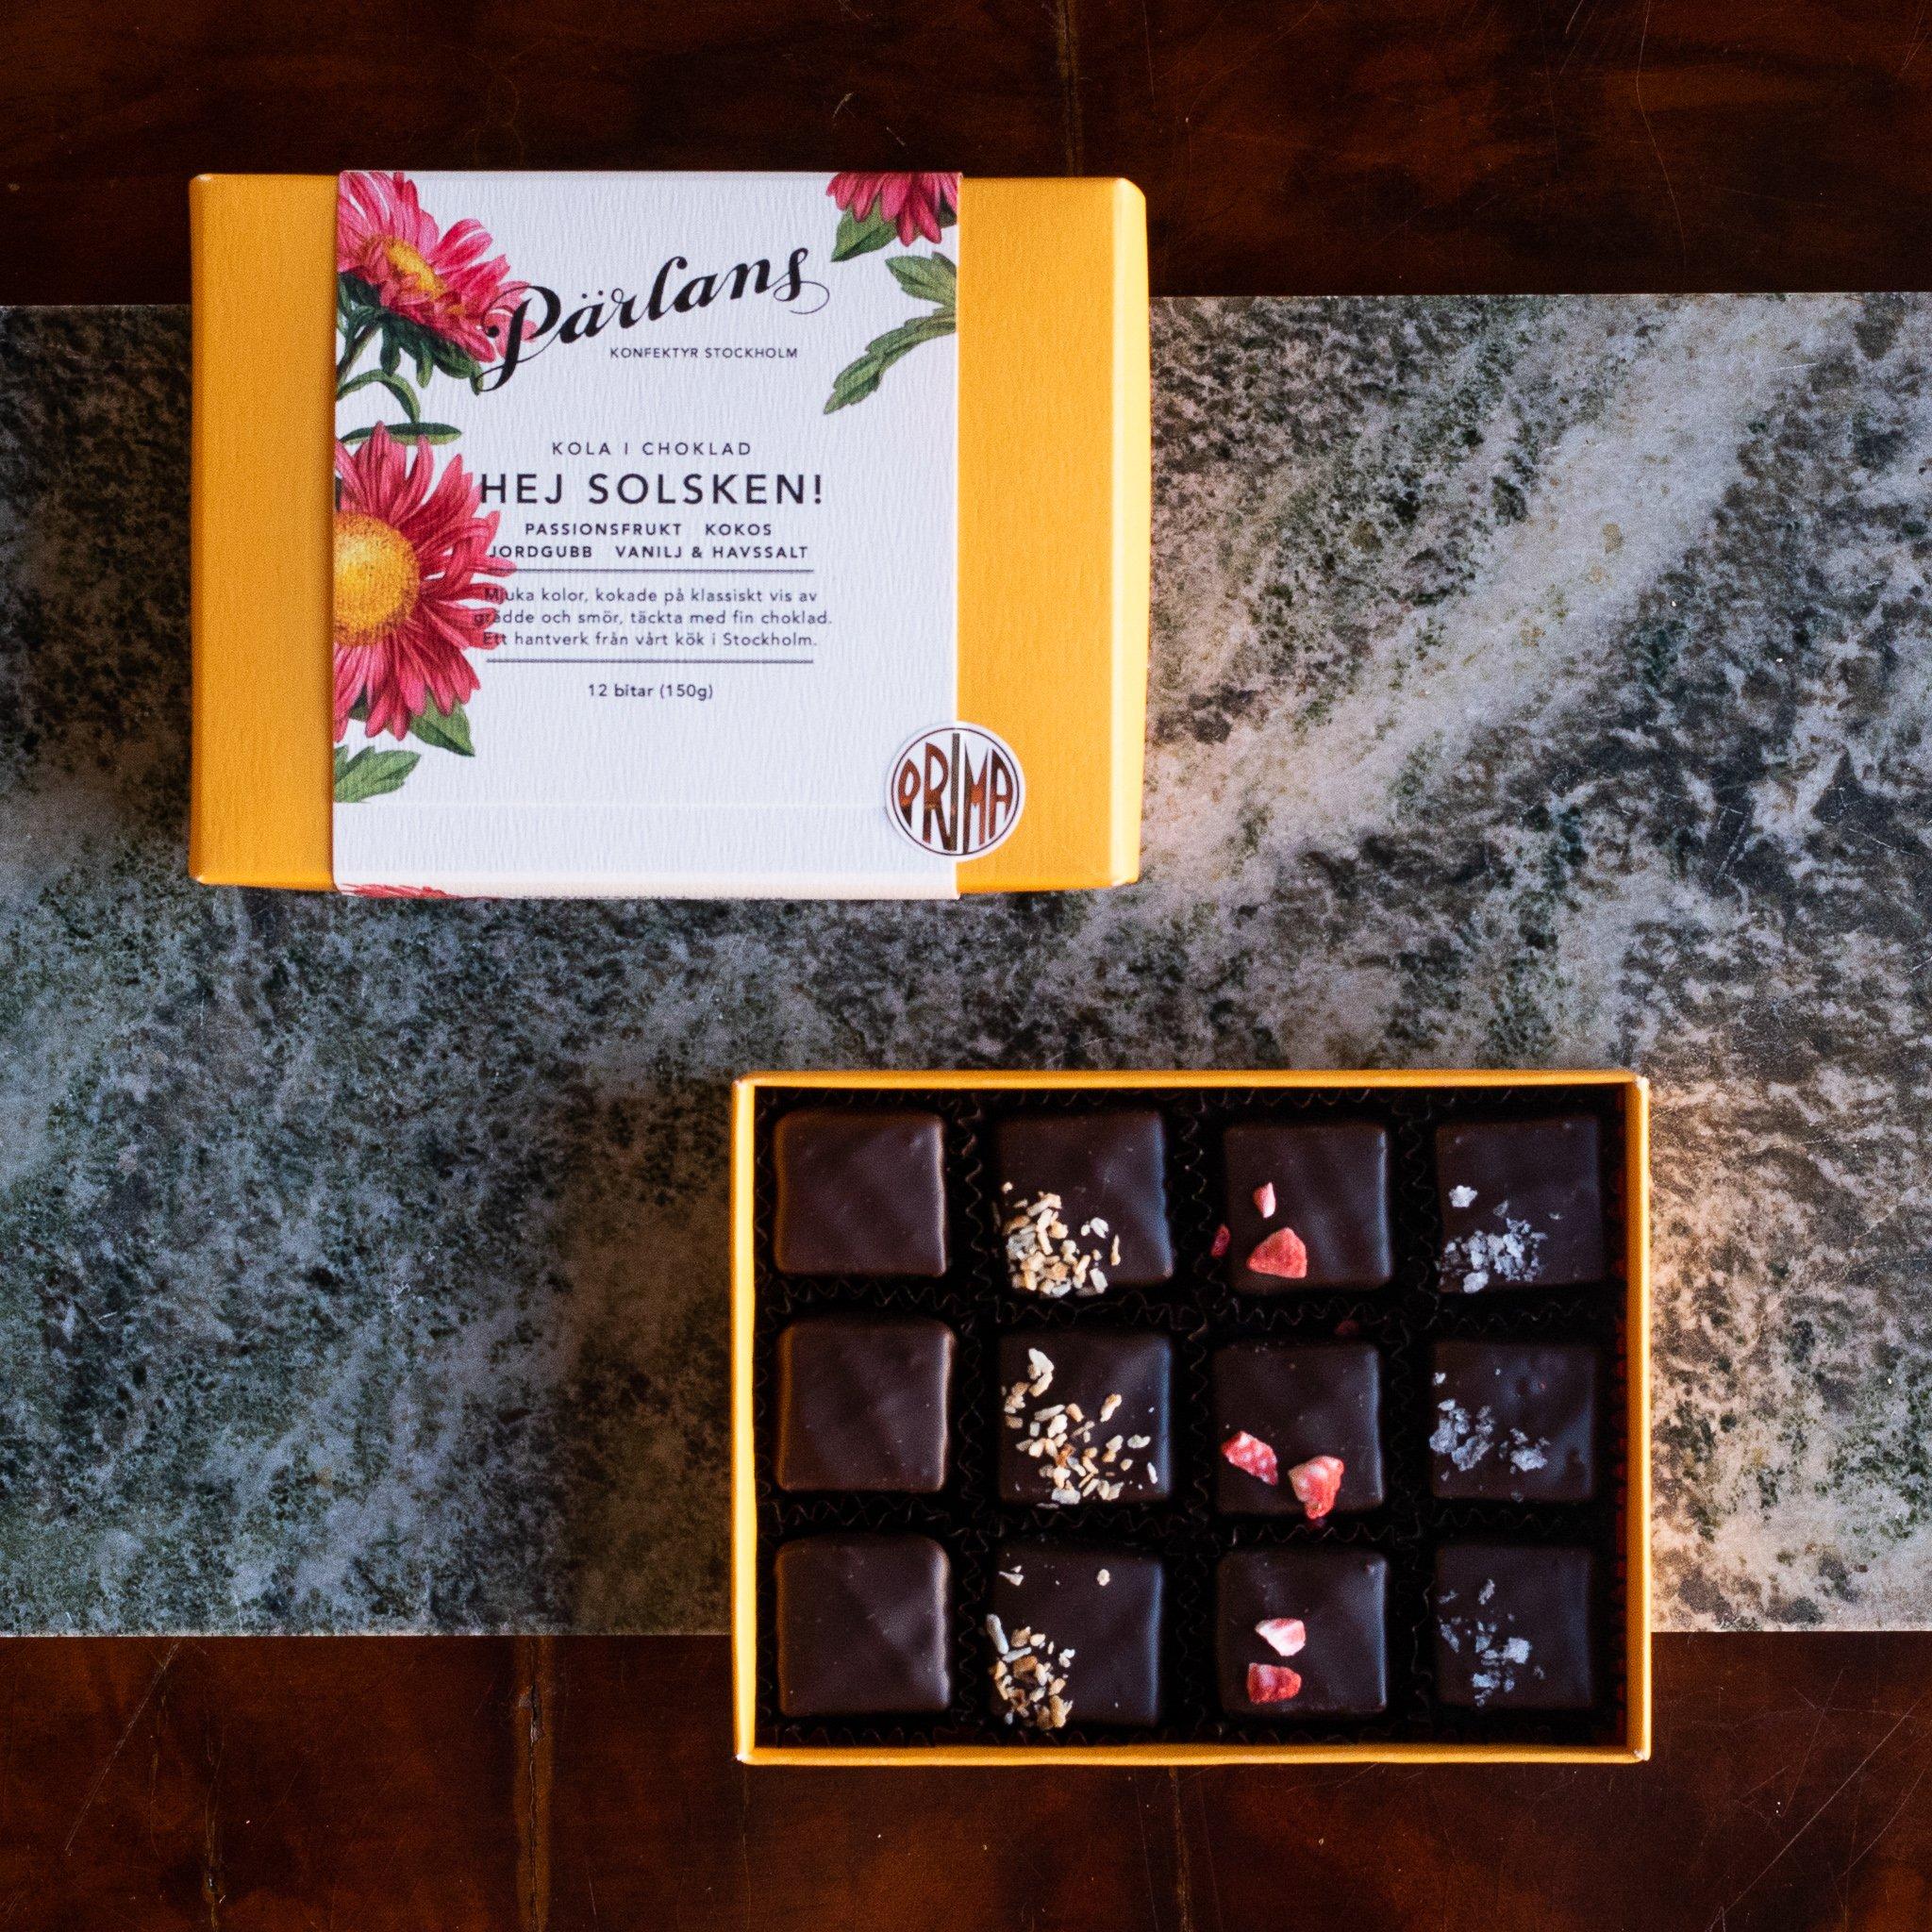 Pärlans Konfektyr karameller i sjokolade - Hej solsken! -